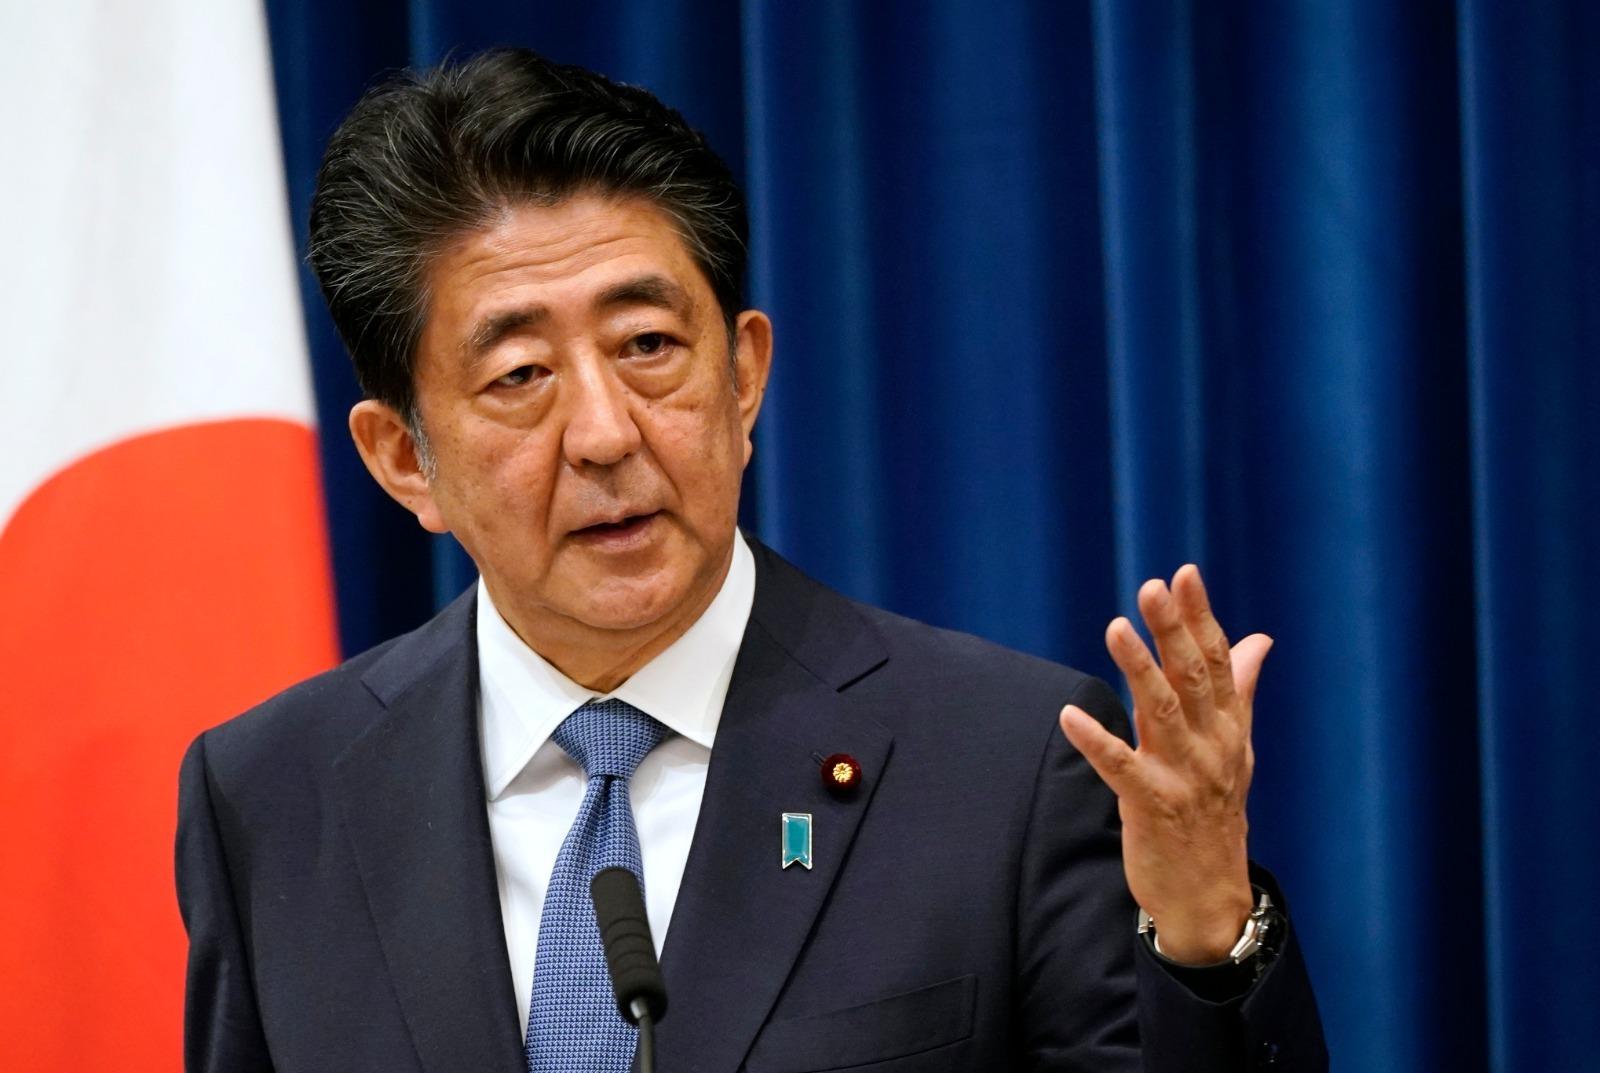 日本首相安倍晉三(Shinzo Abe)2020年8月28日宣佈,因健康原因,決定辭職。(FRANCK ROBICHON/POOL/AFP via Getty Images)